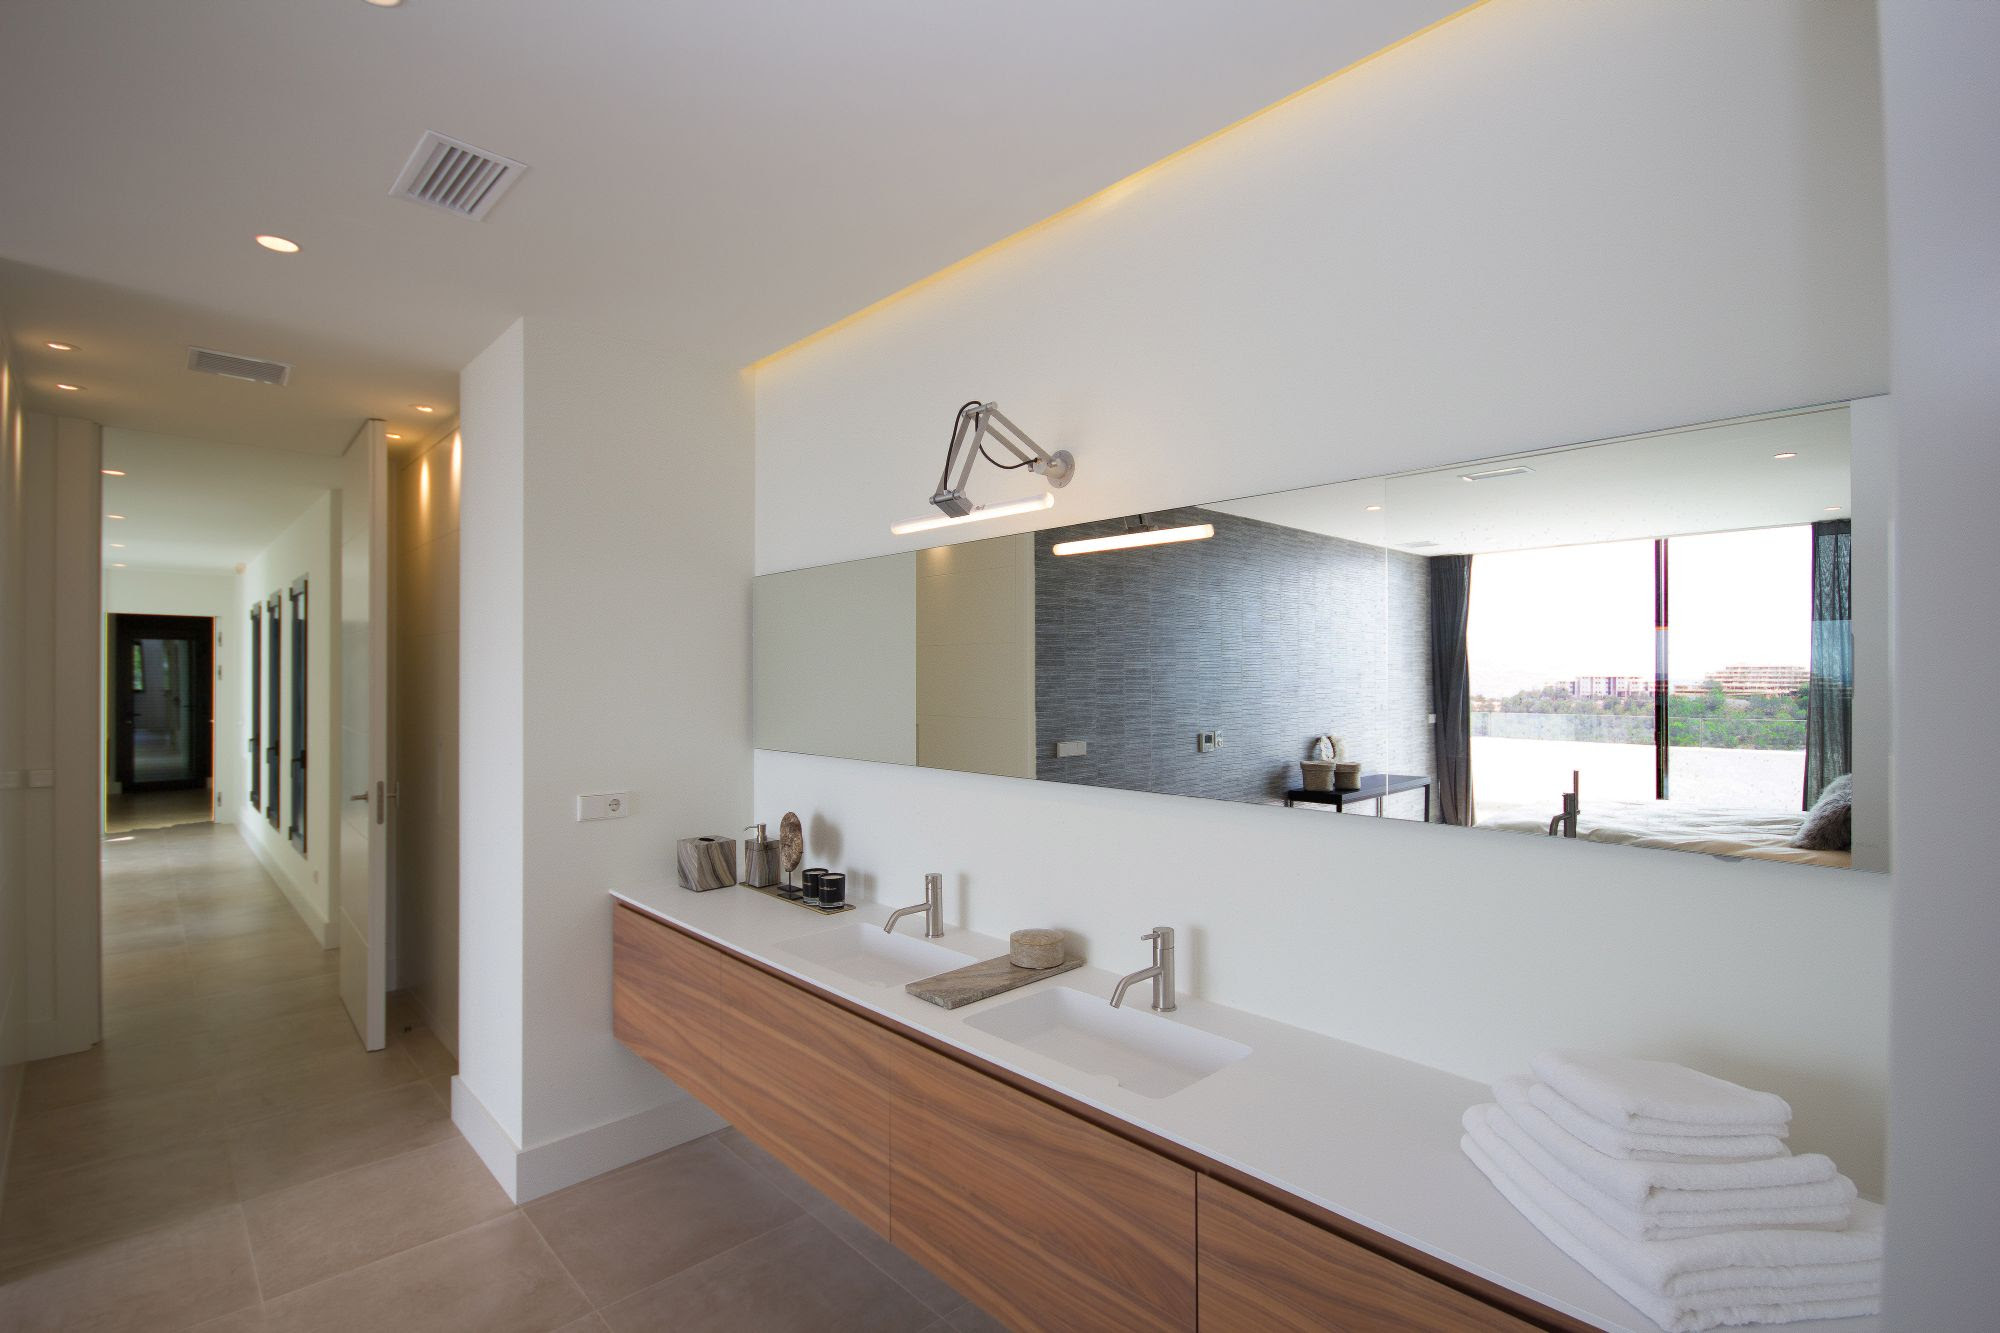 4 bedroom villa For Sale in Altea - photograph 4